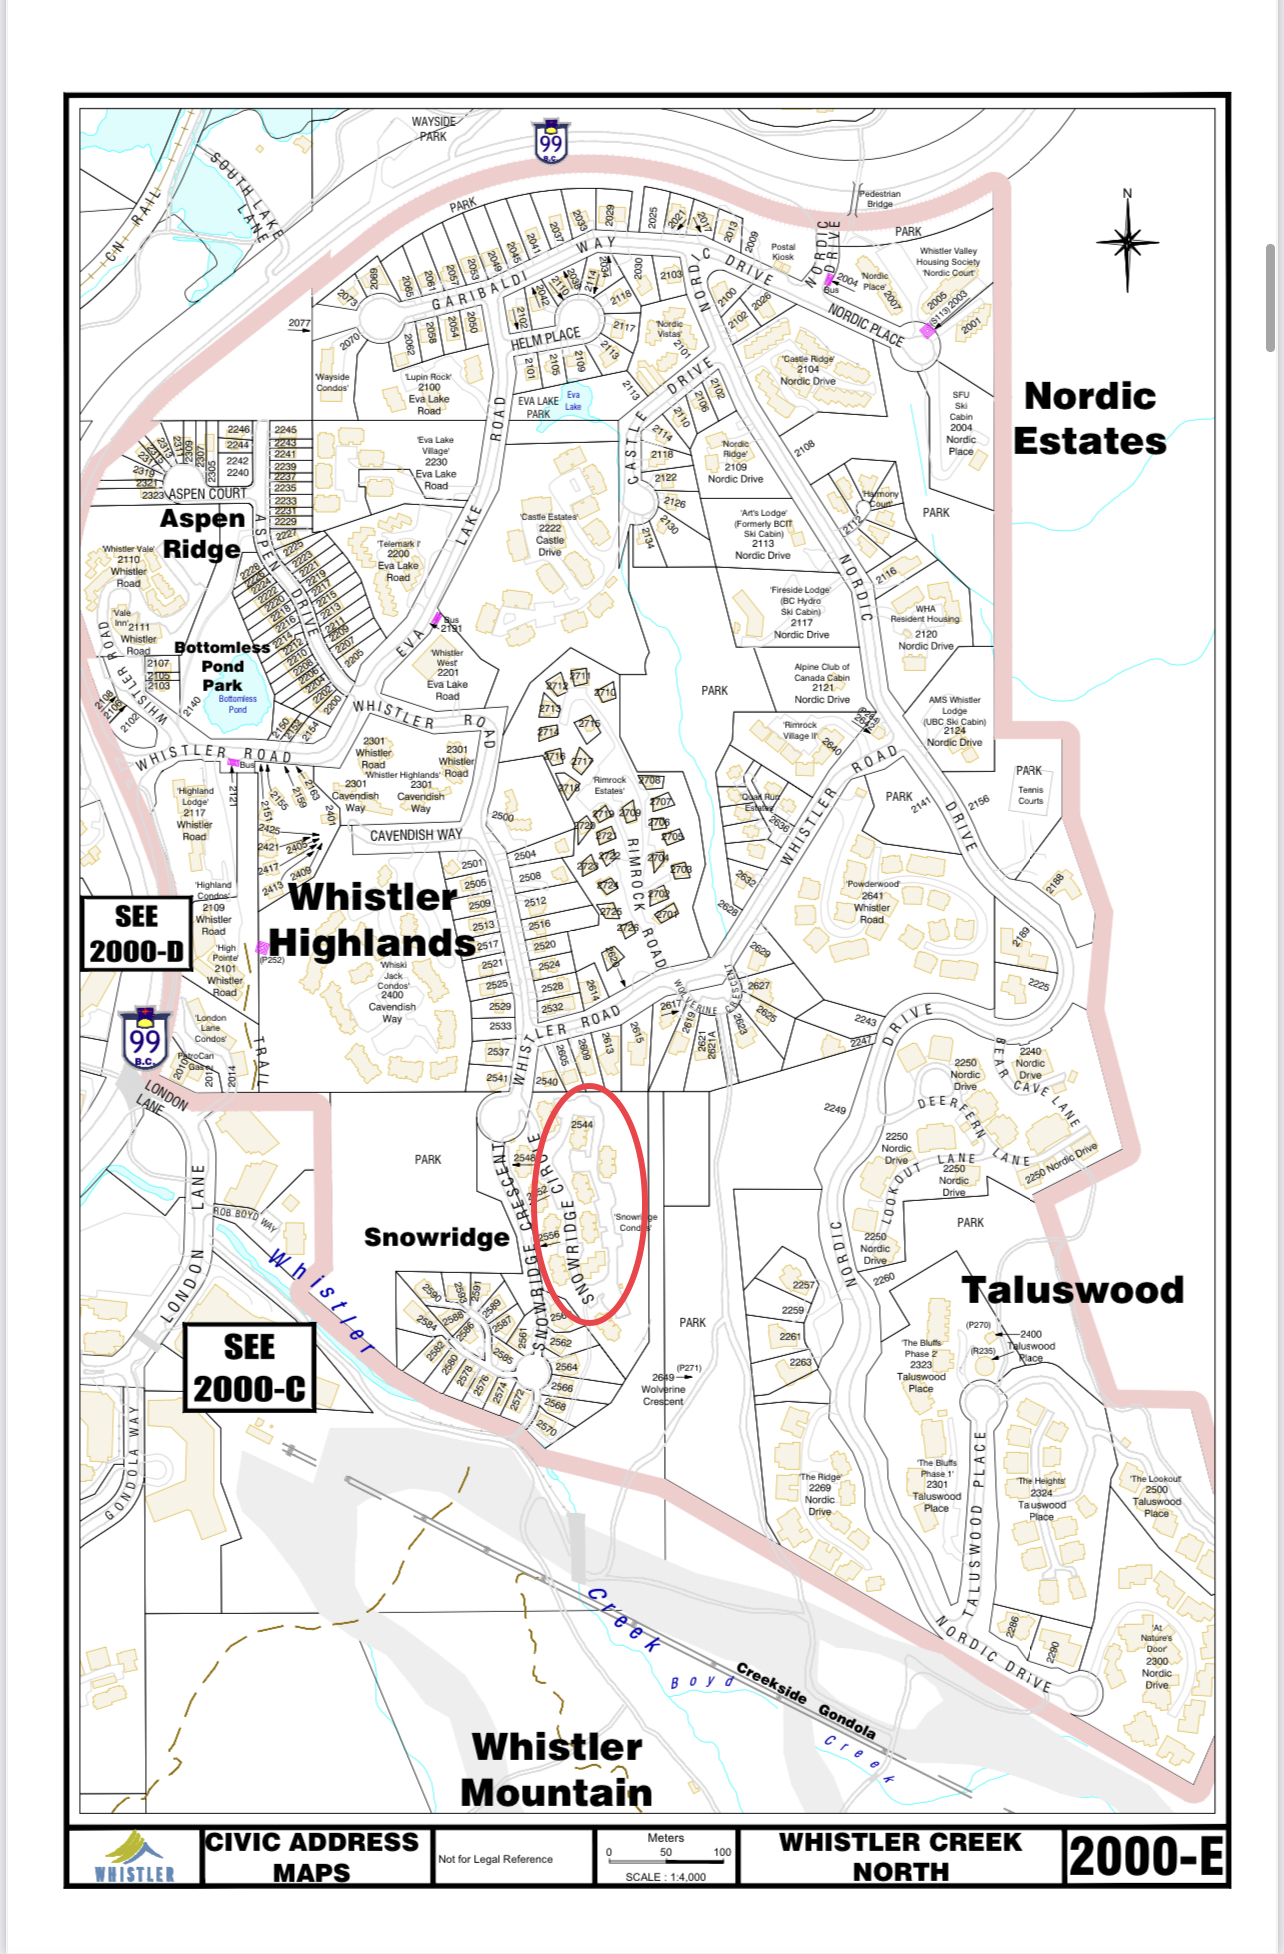 Snowridge Circle Civic Address map